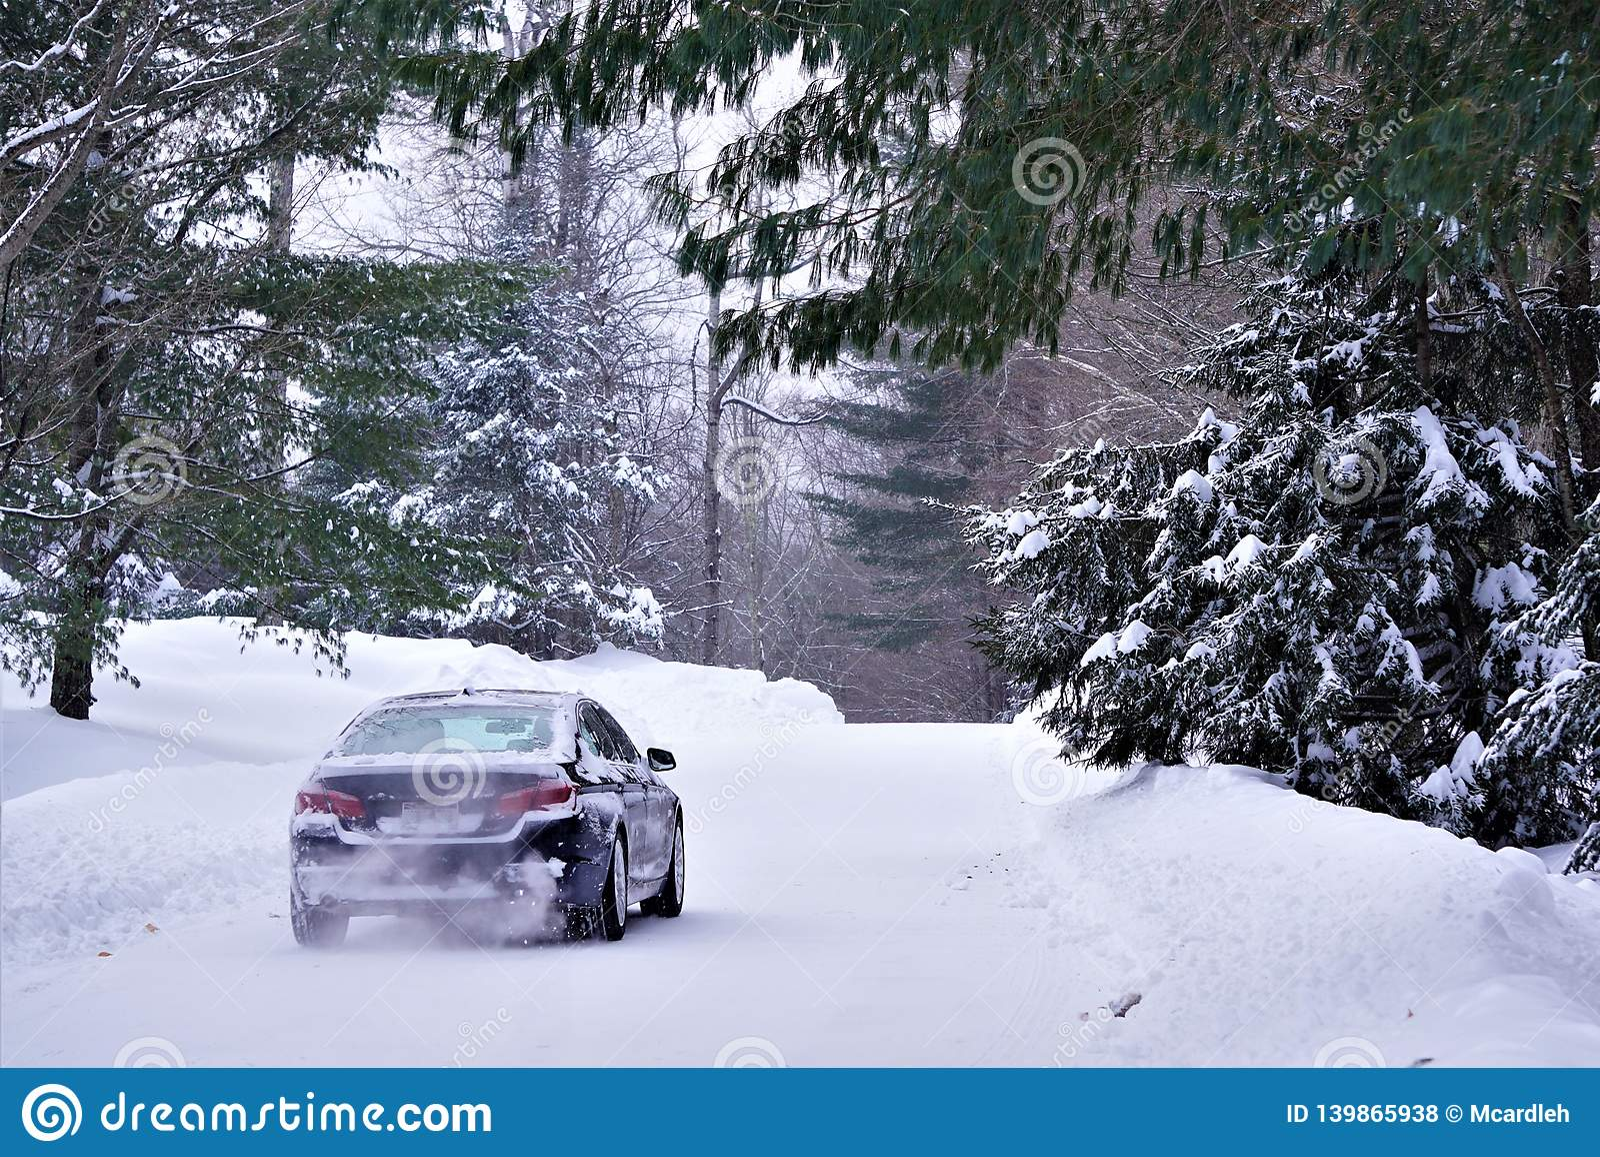 Car drives on snowy road